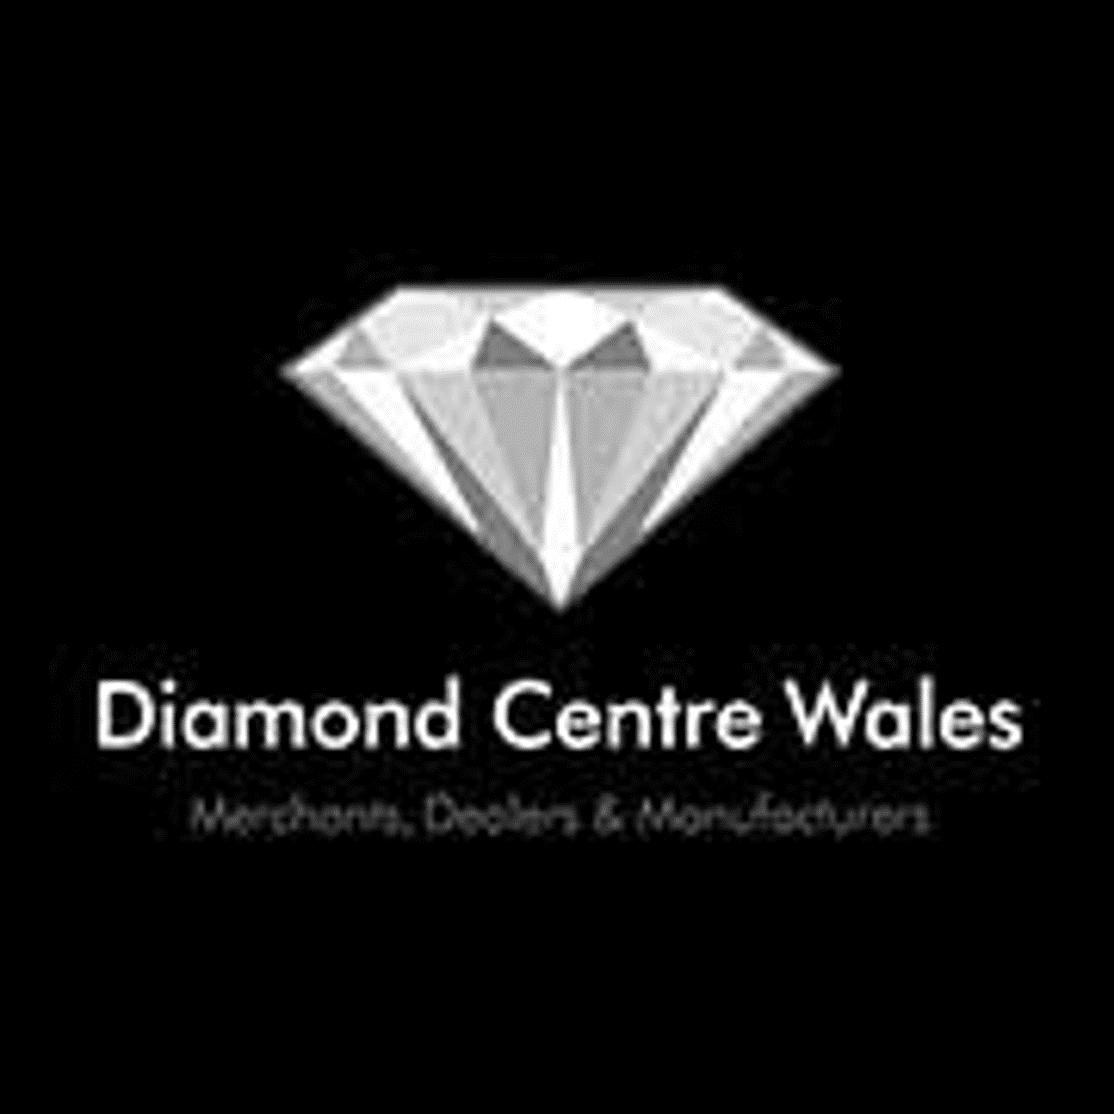 Diamond centre